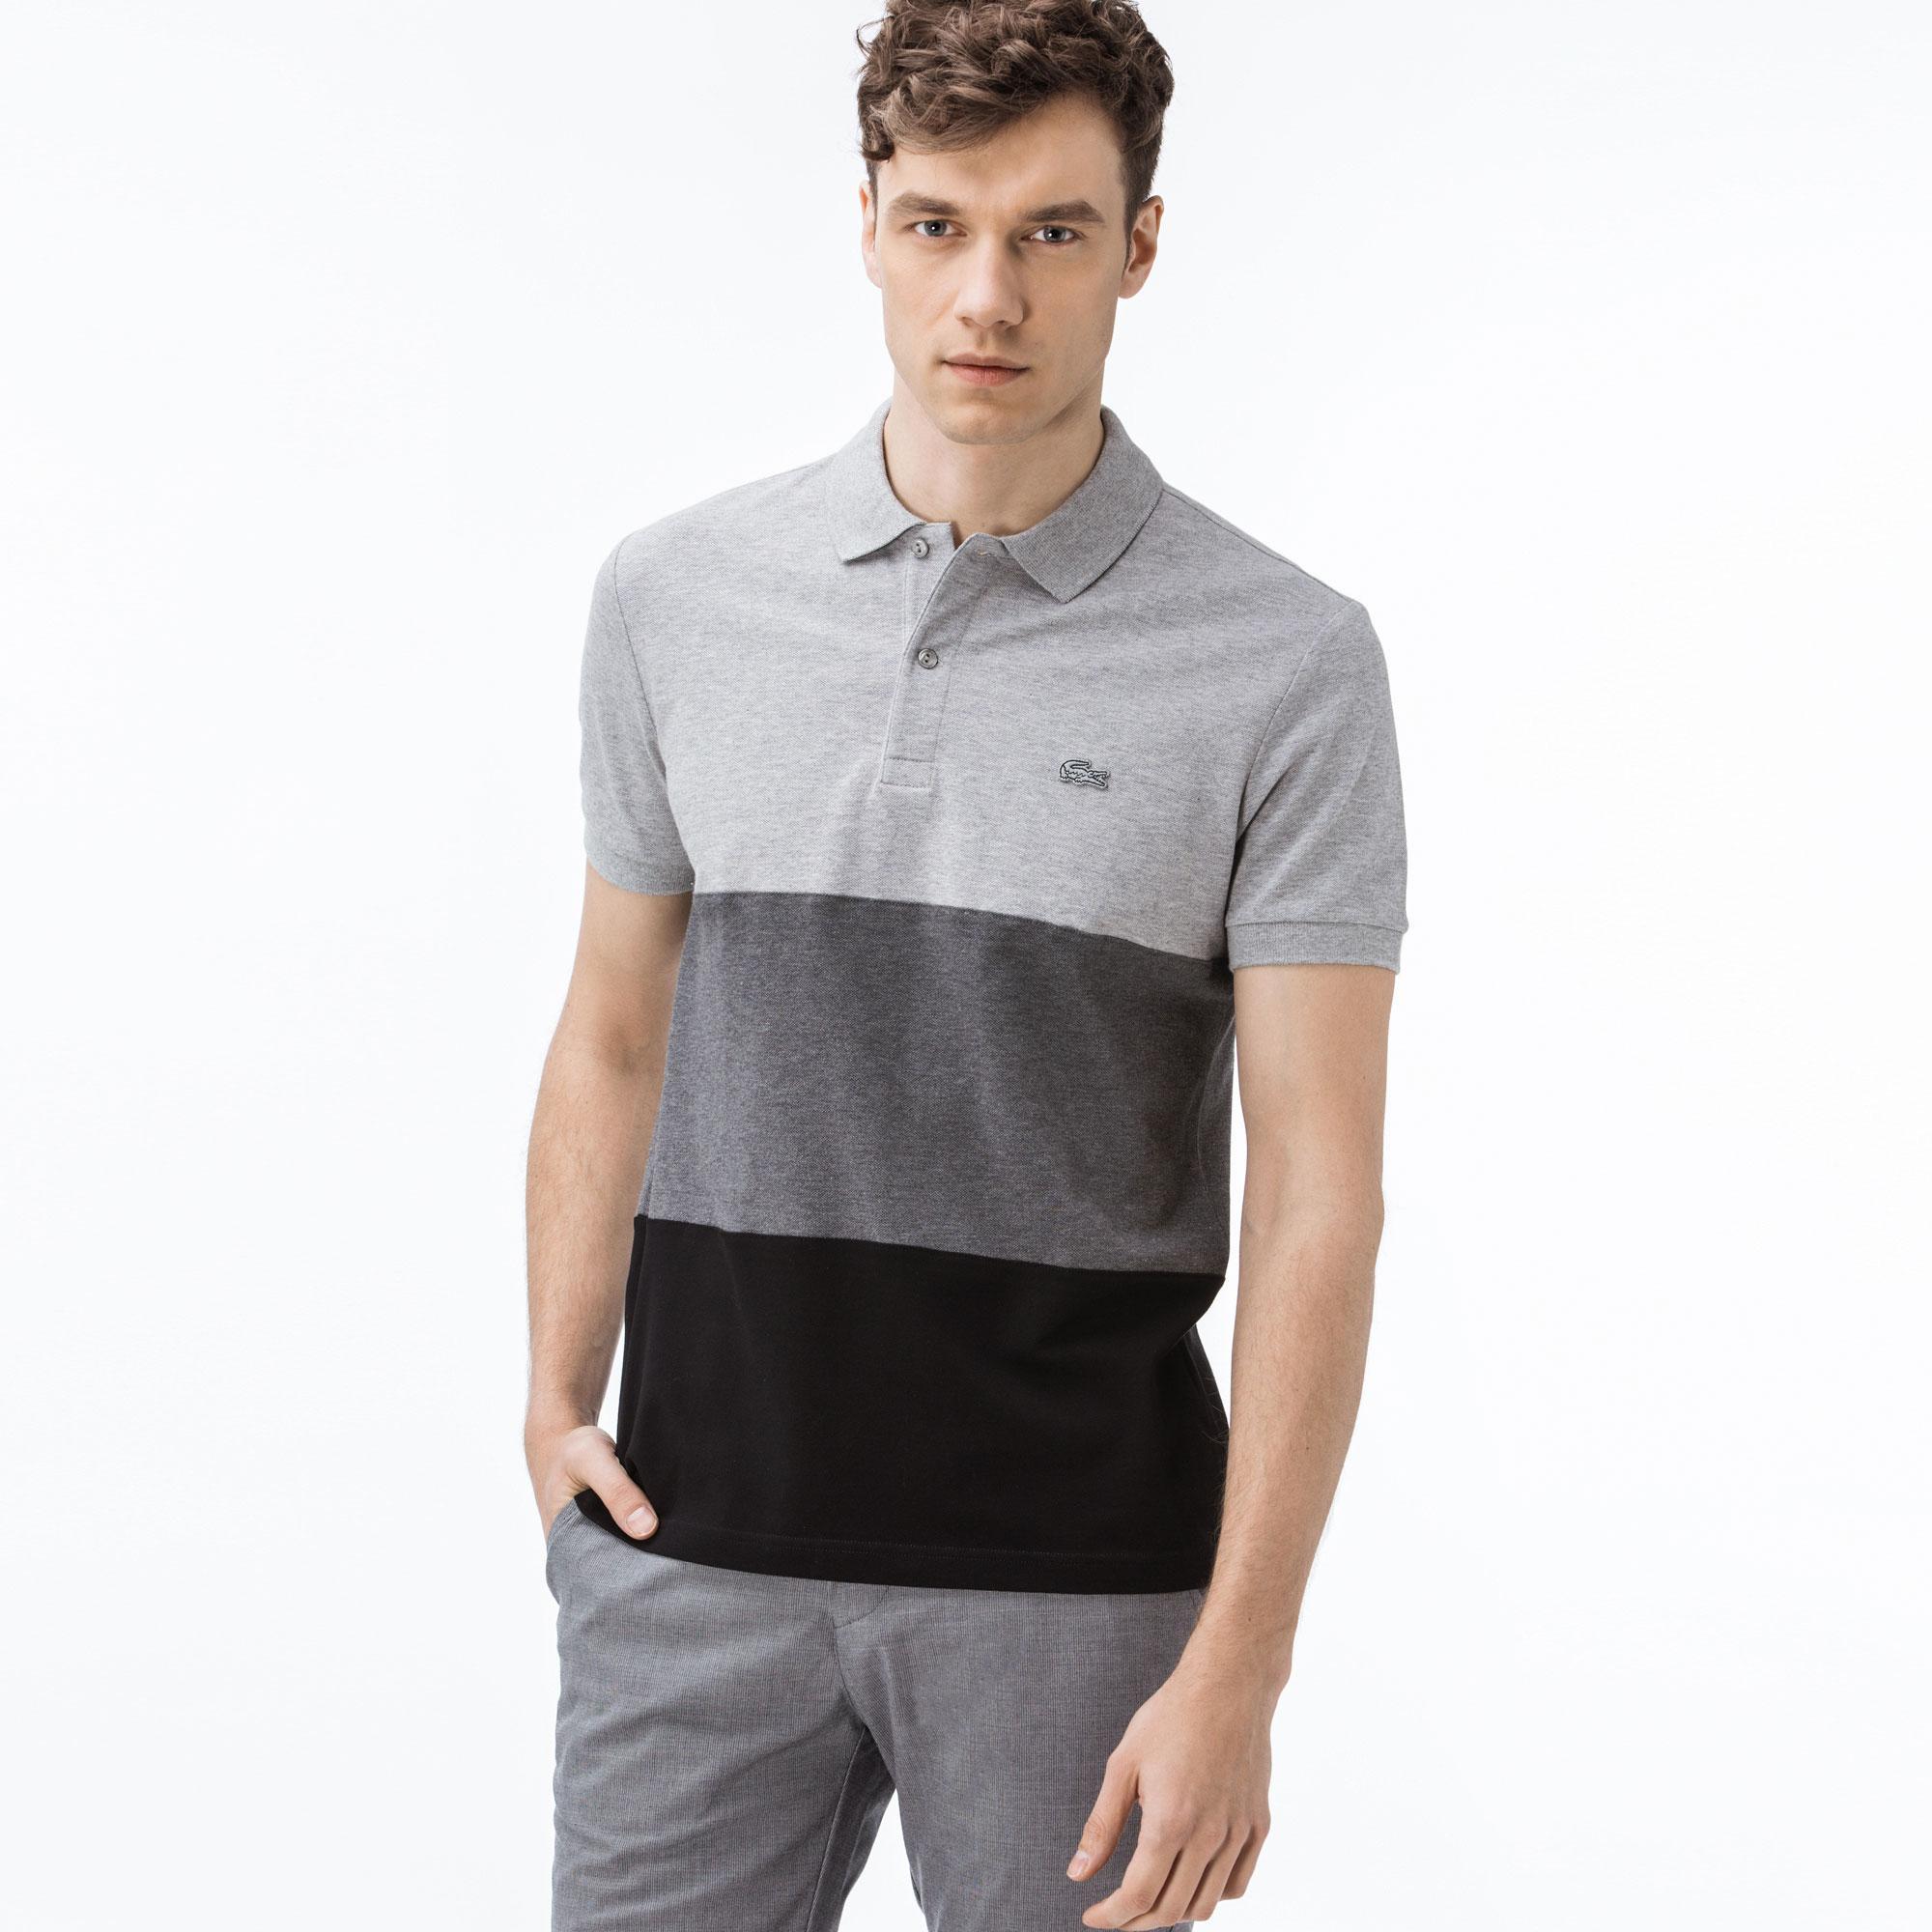 Lacoste Erkek Regular Fit Blok Desenli Renkli Polo